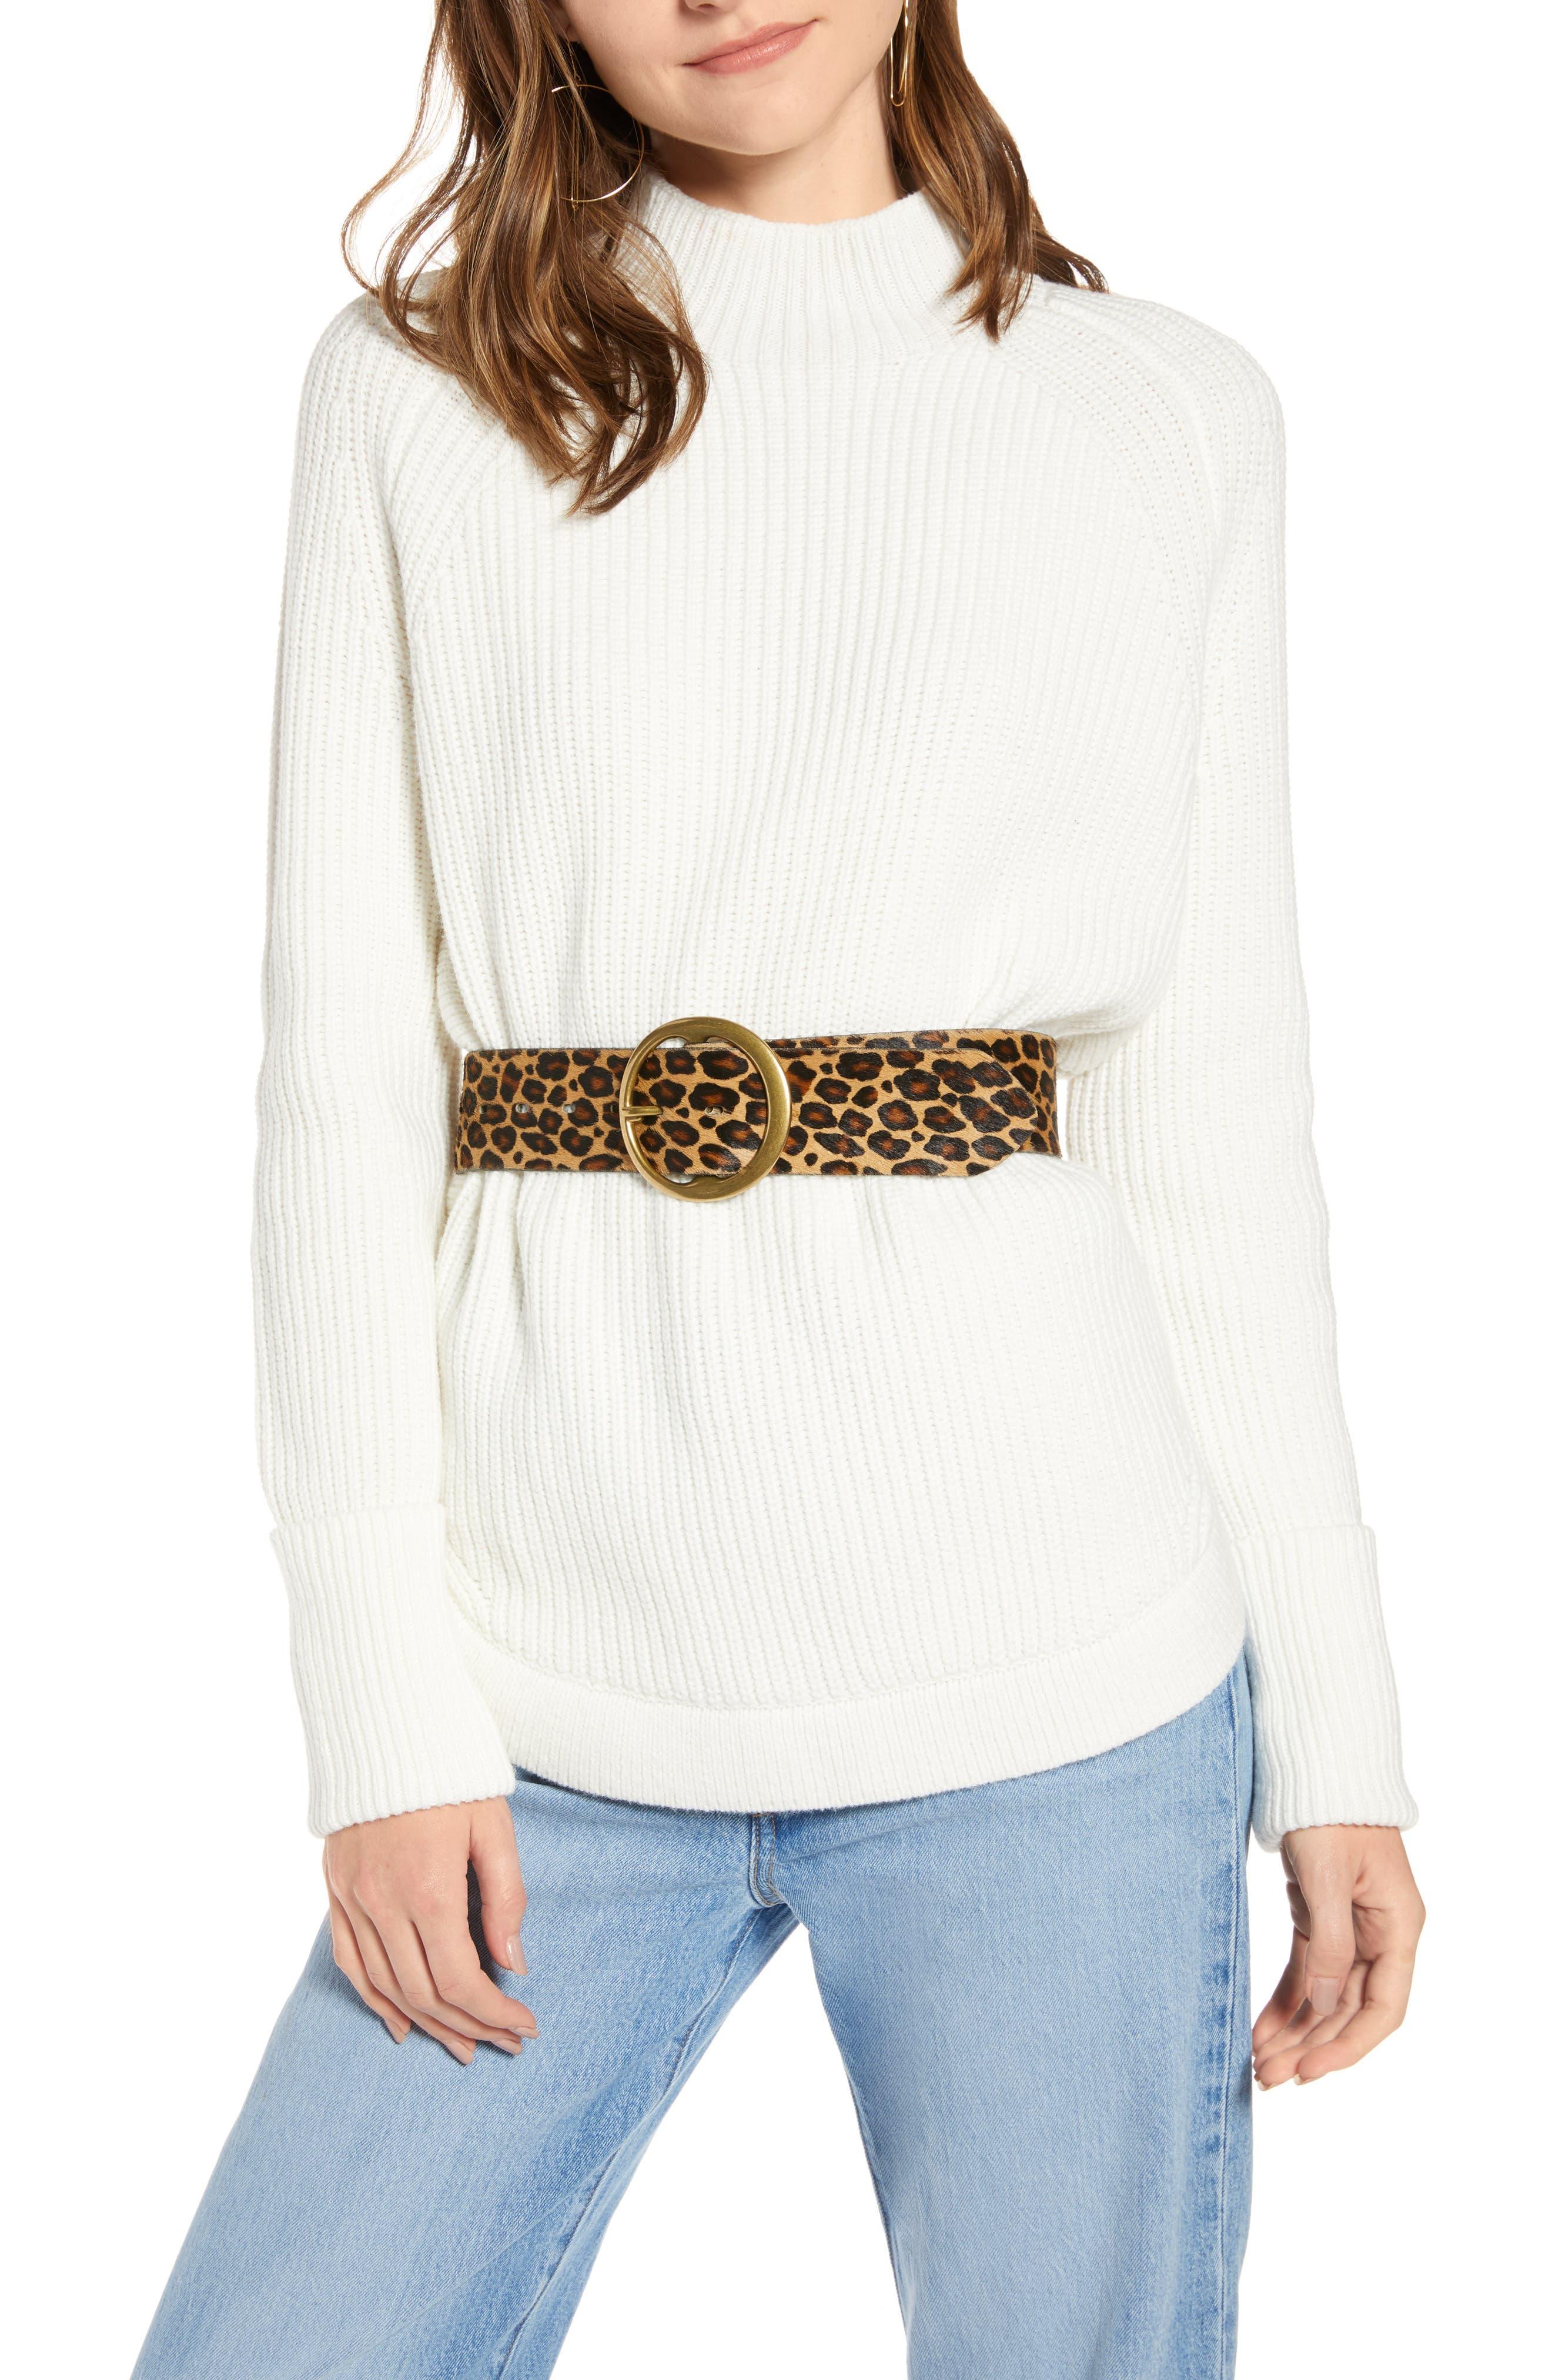 Treasure & Bond Mock Neck Sweater (Regular & Plus Size)